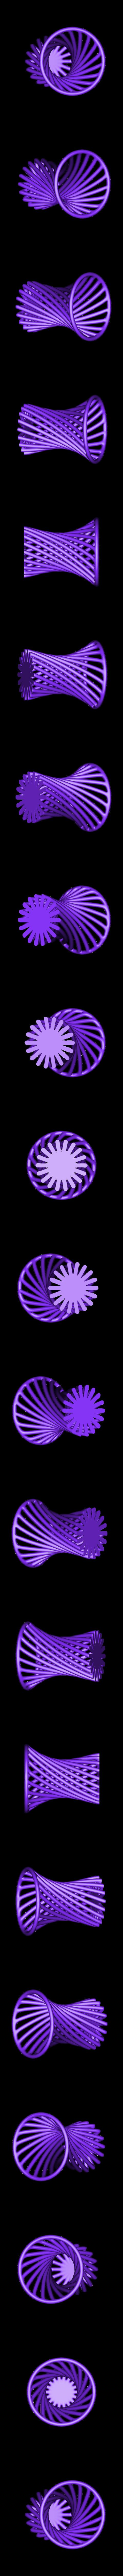 LapiceroRe.stl Download free STL file Twisting vase / pencil holder • 3D printer object, llaffa